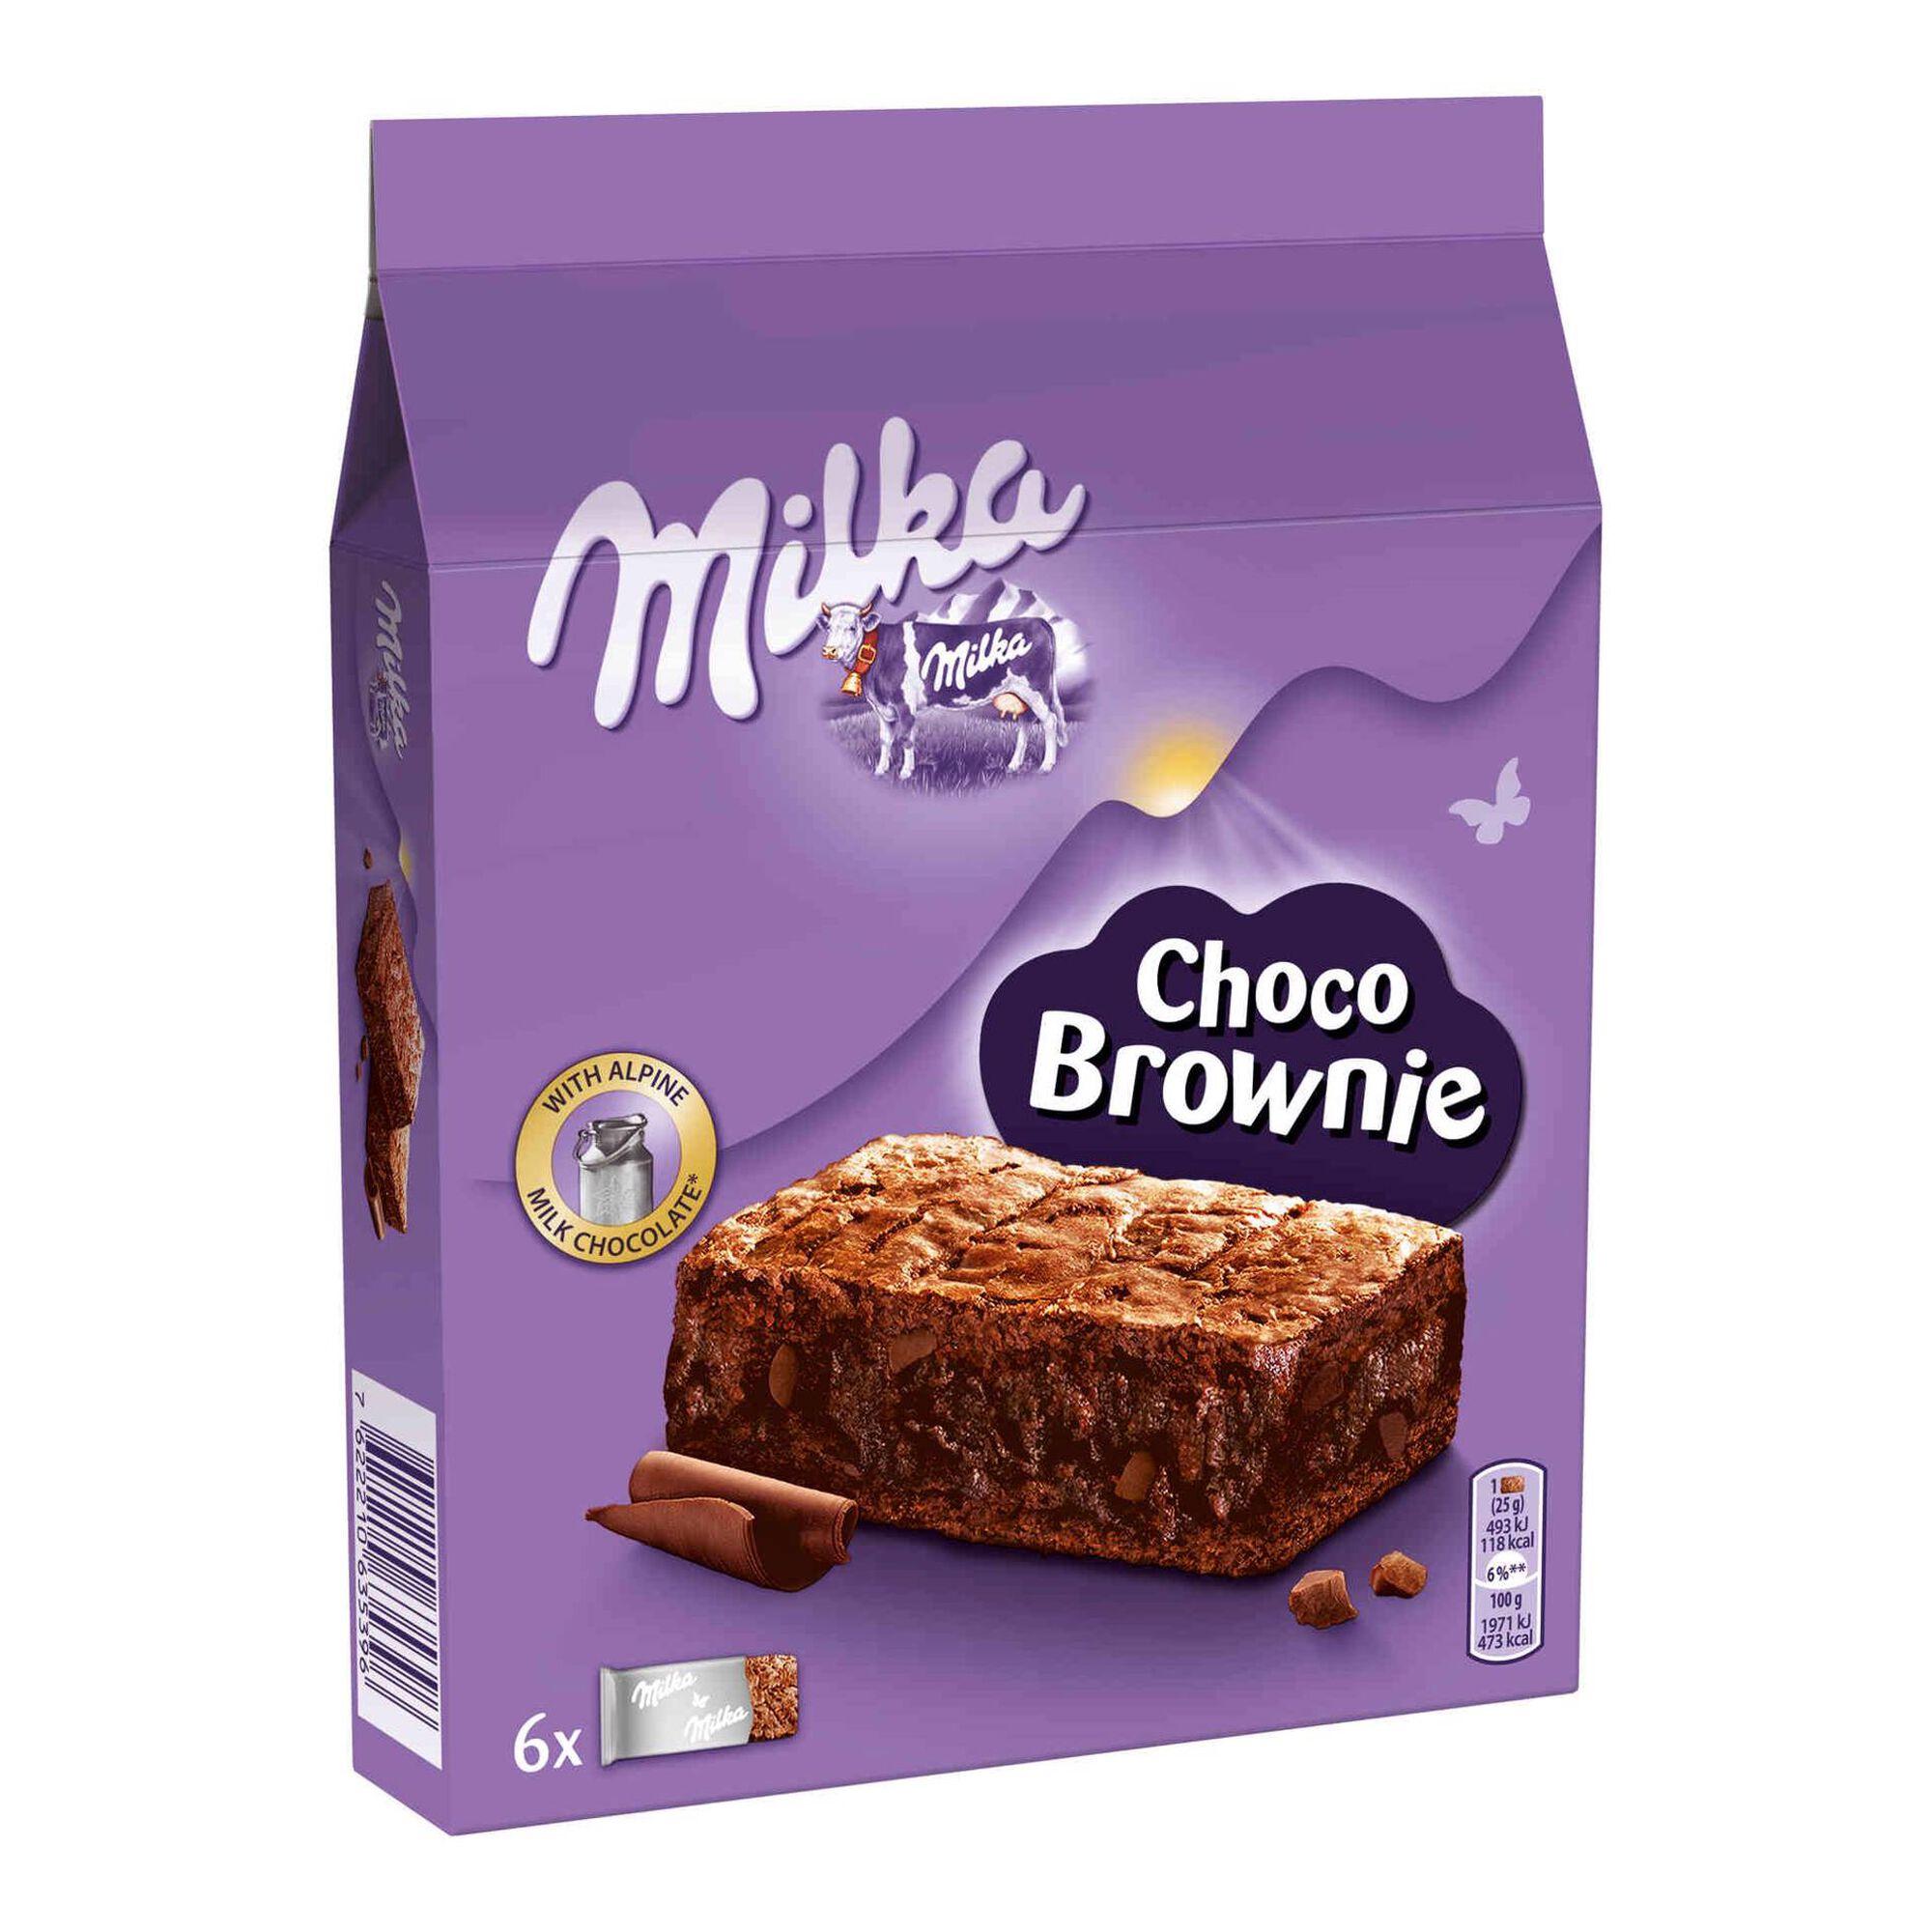 Bolo Choco Brownie